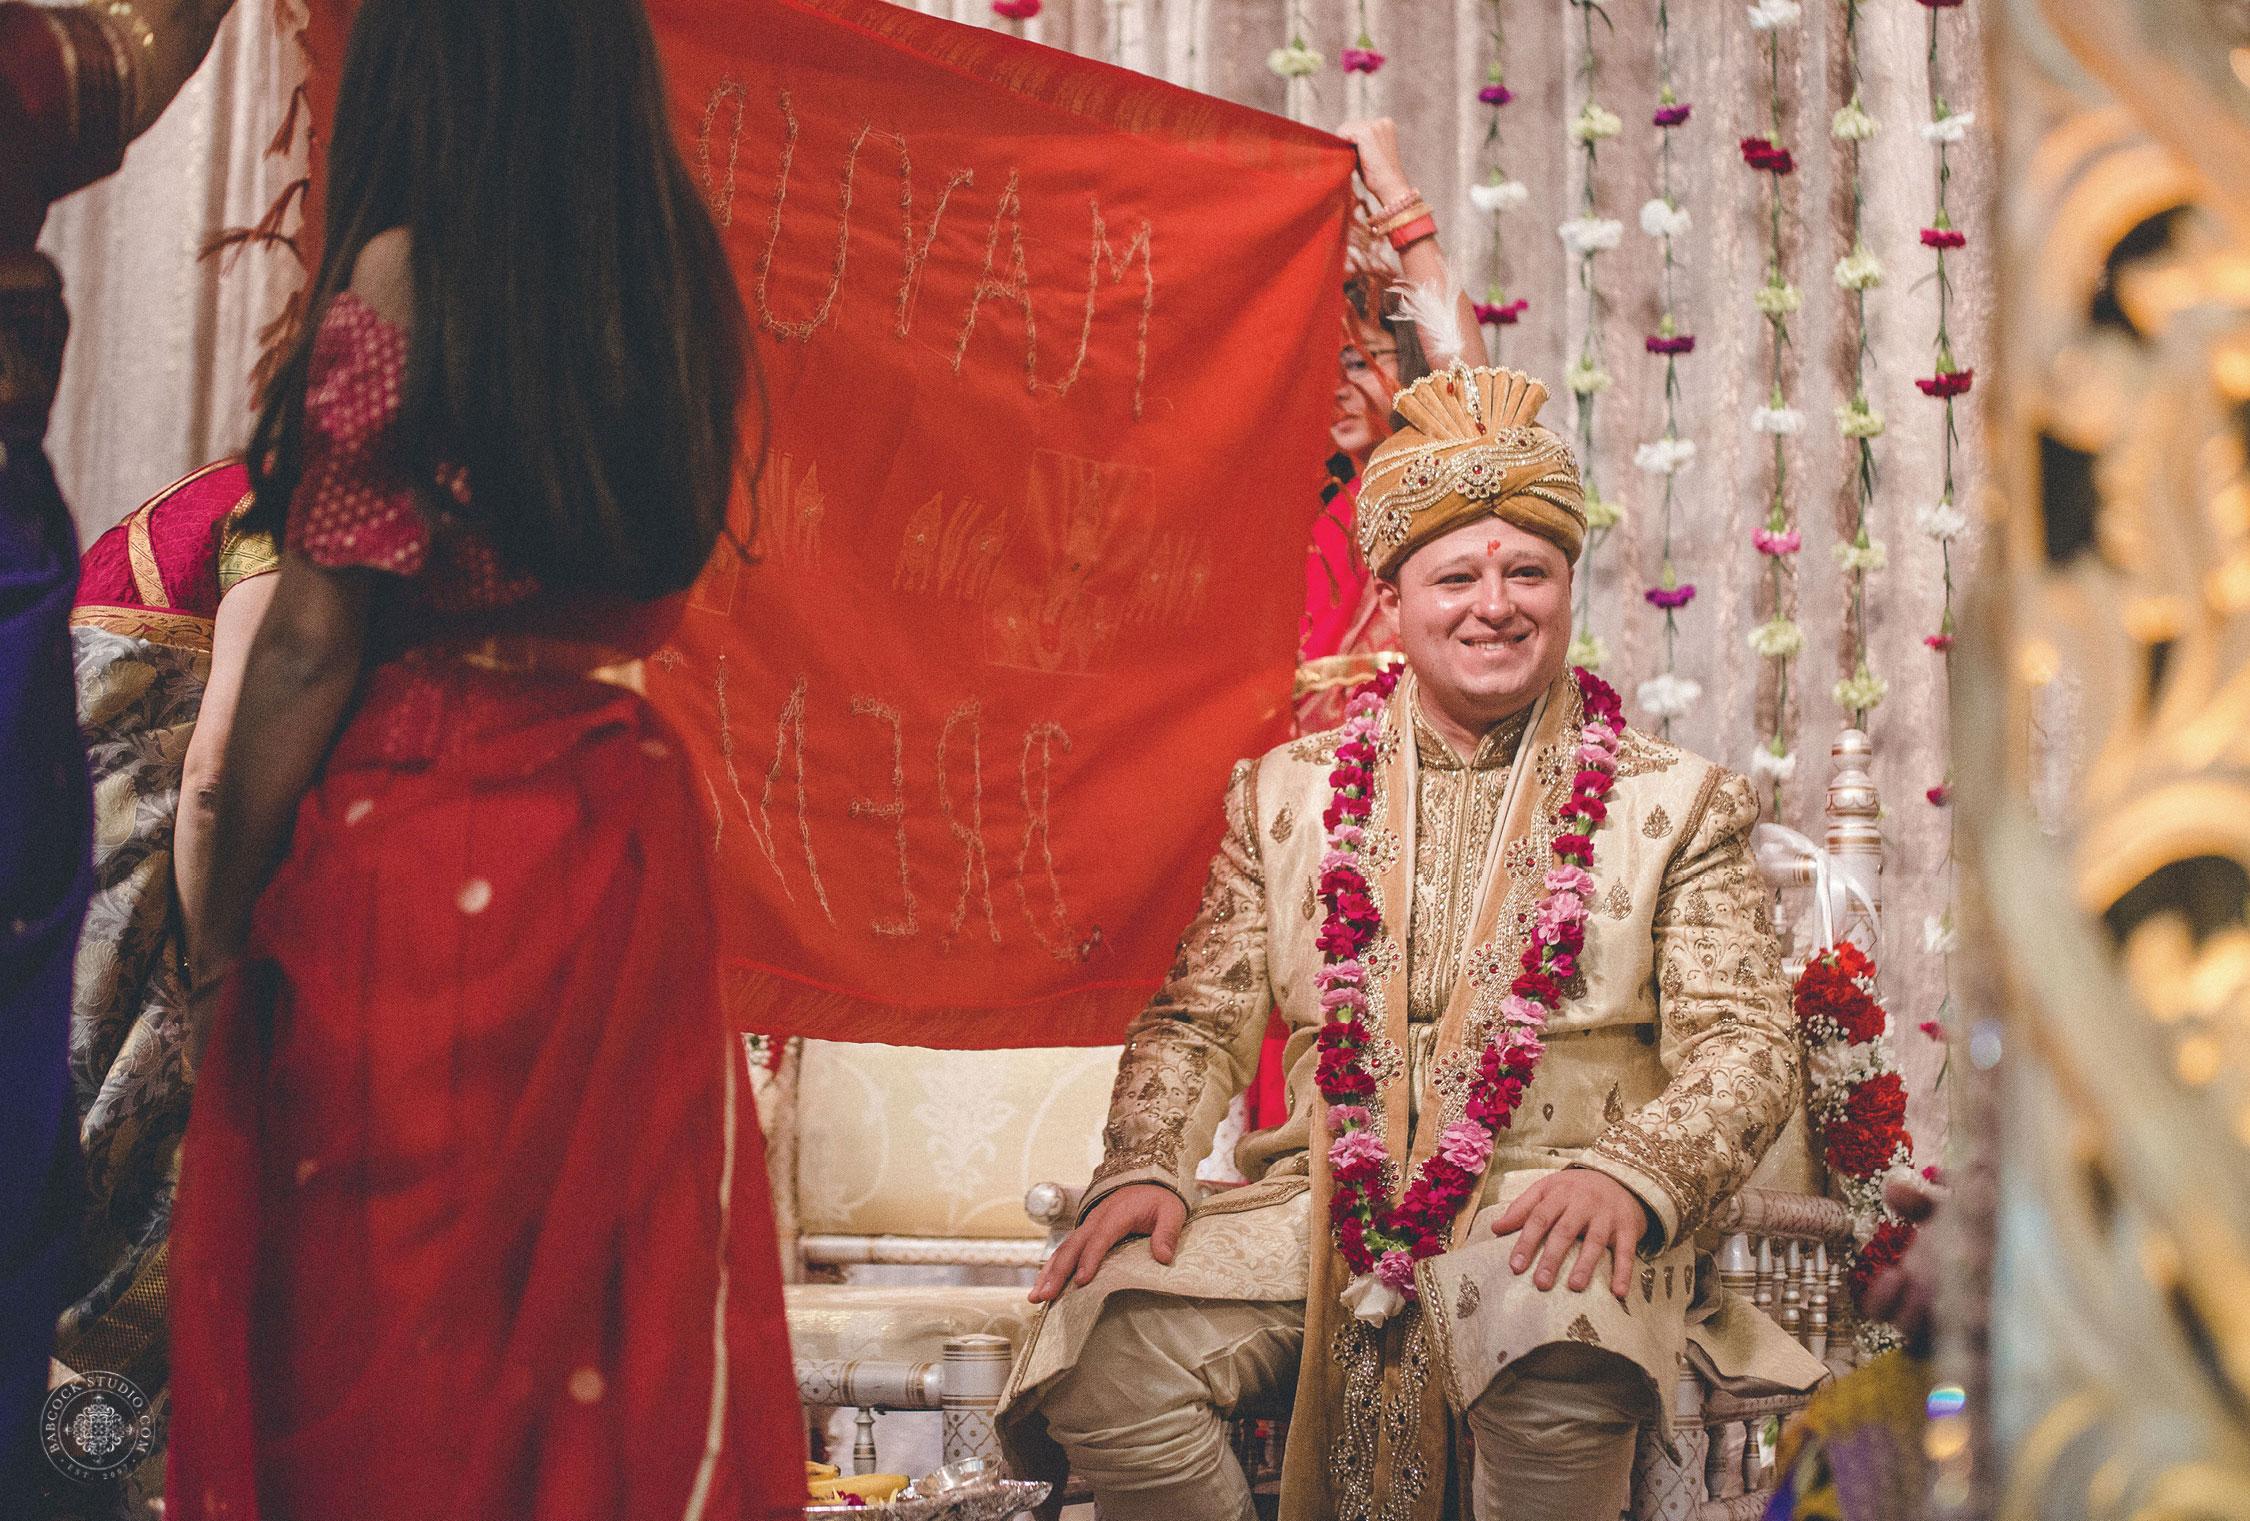 mayuri-brent-indian-wedding-photographer-dayton-ohio-16.jpg